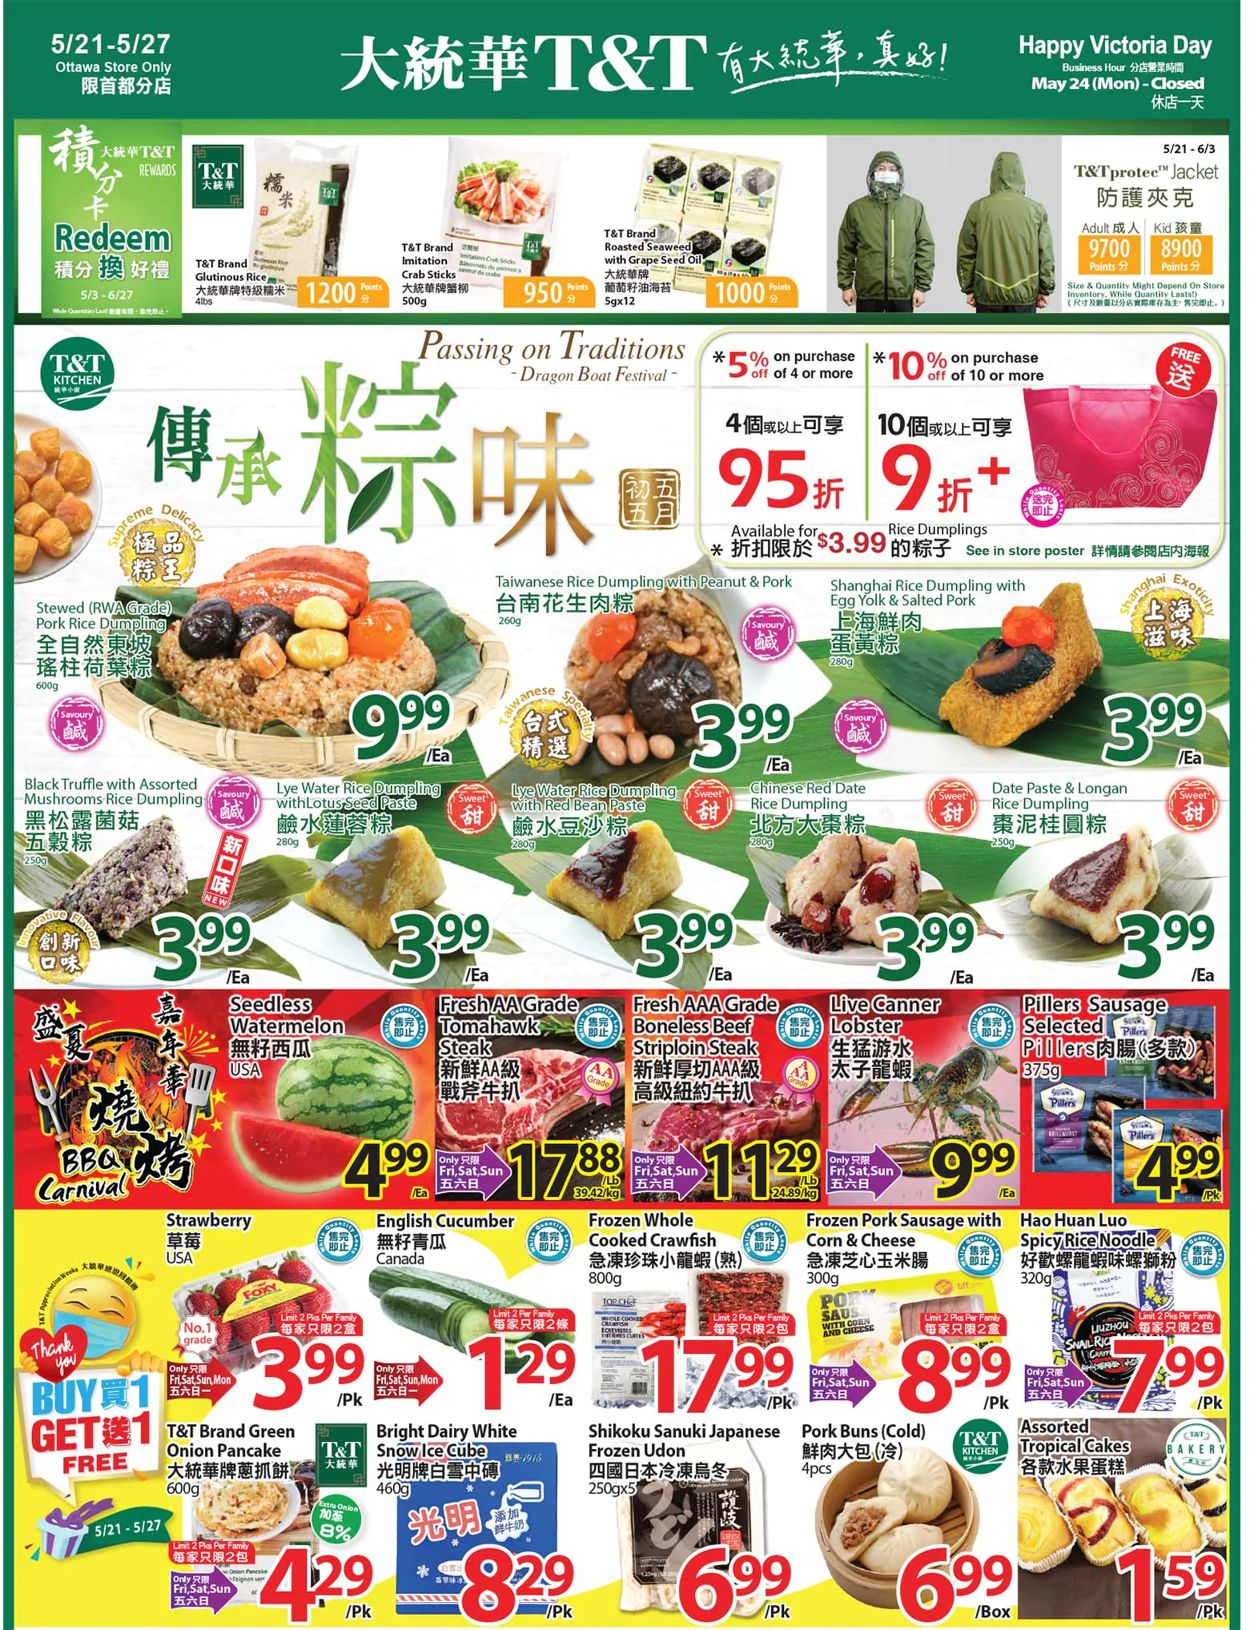 T&T Supermarket - Ottawa Flyer - 05/21-05/27/2021